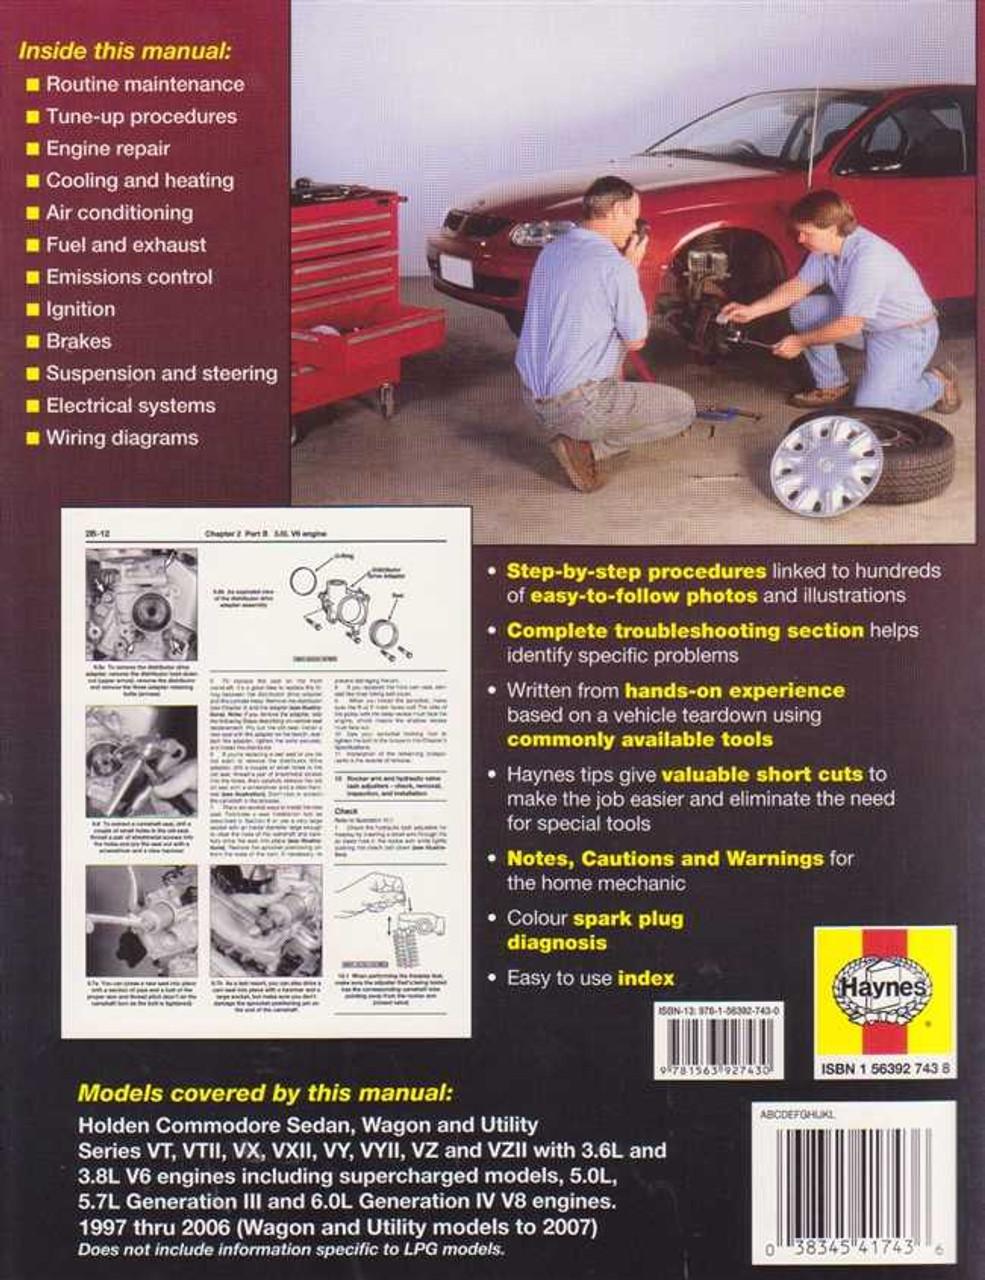 Holden commodore vt vx vy vz series v6 and v8 1997 2006 holden commodore vt vx vy vz series v6 and v8 1997 2006 workshop manual asfbconference2016 Images